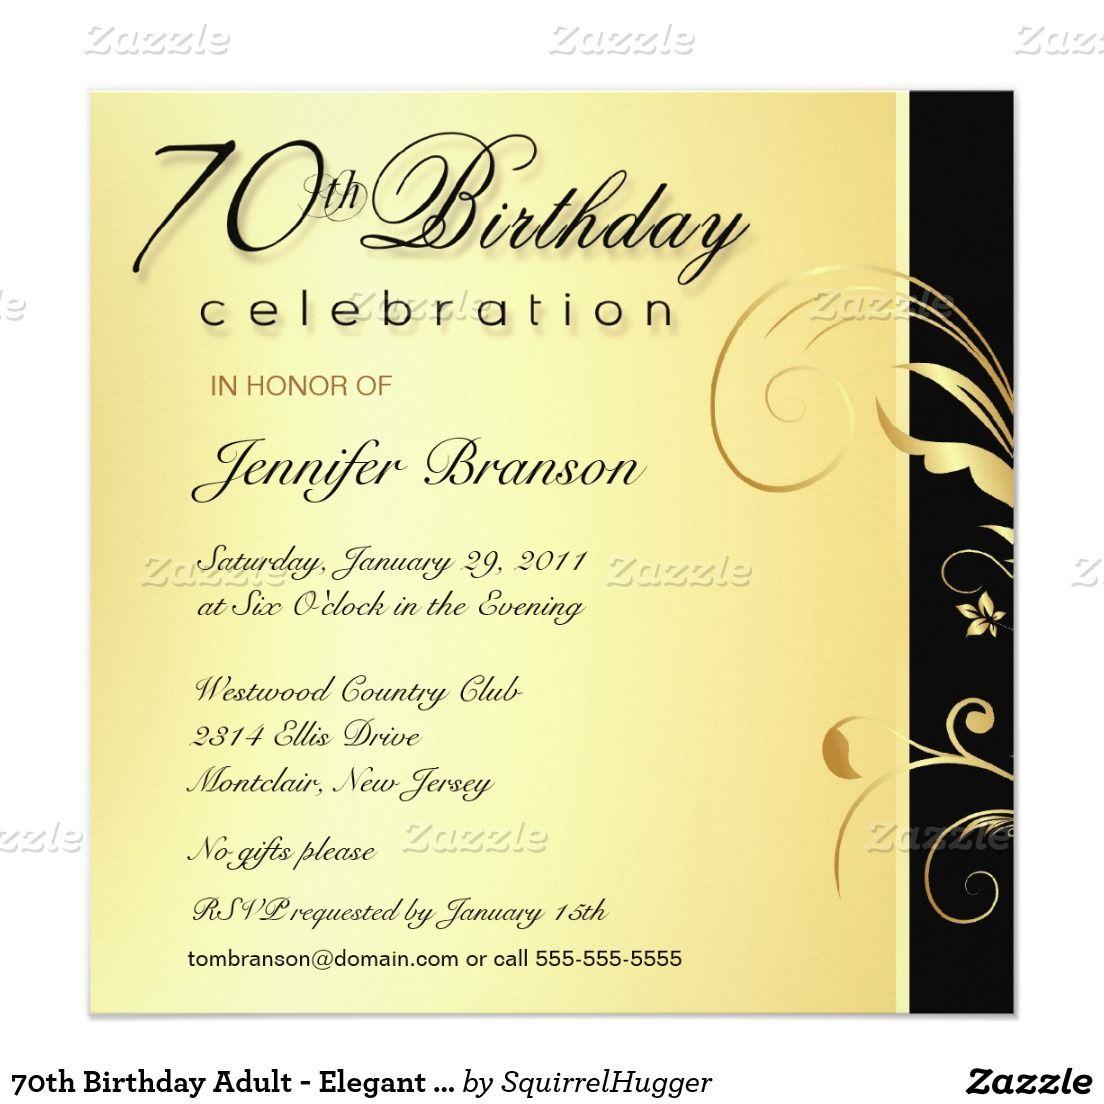 70th Birthday Adult - Elegant Gold Floral Invites | 70 birthday and ...